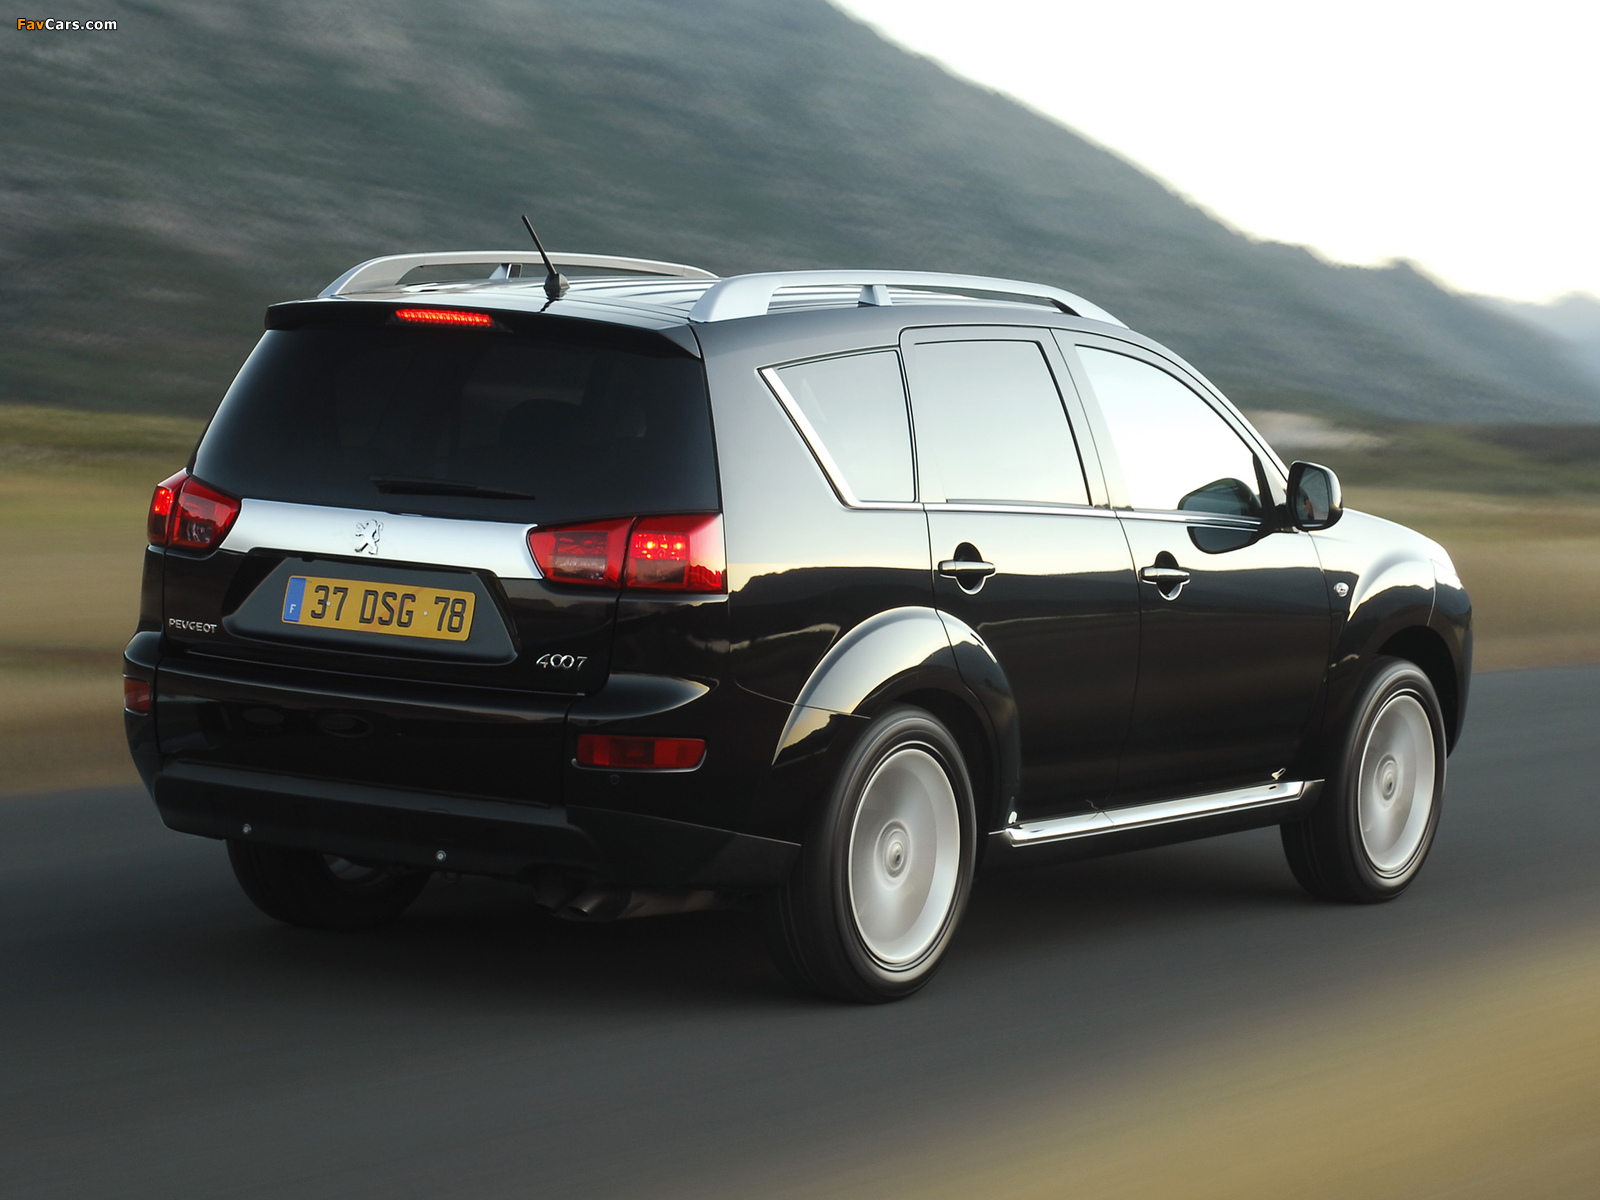 Peugeot 4007 2007 photos (1600 x 1200)